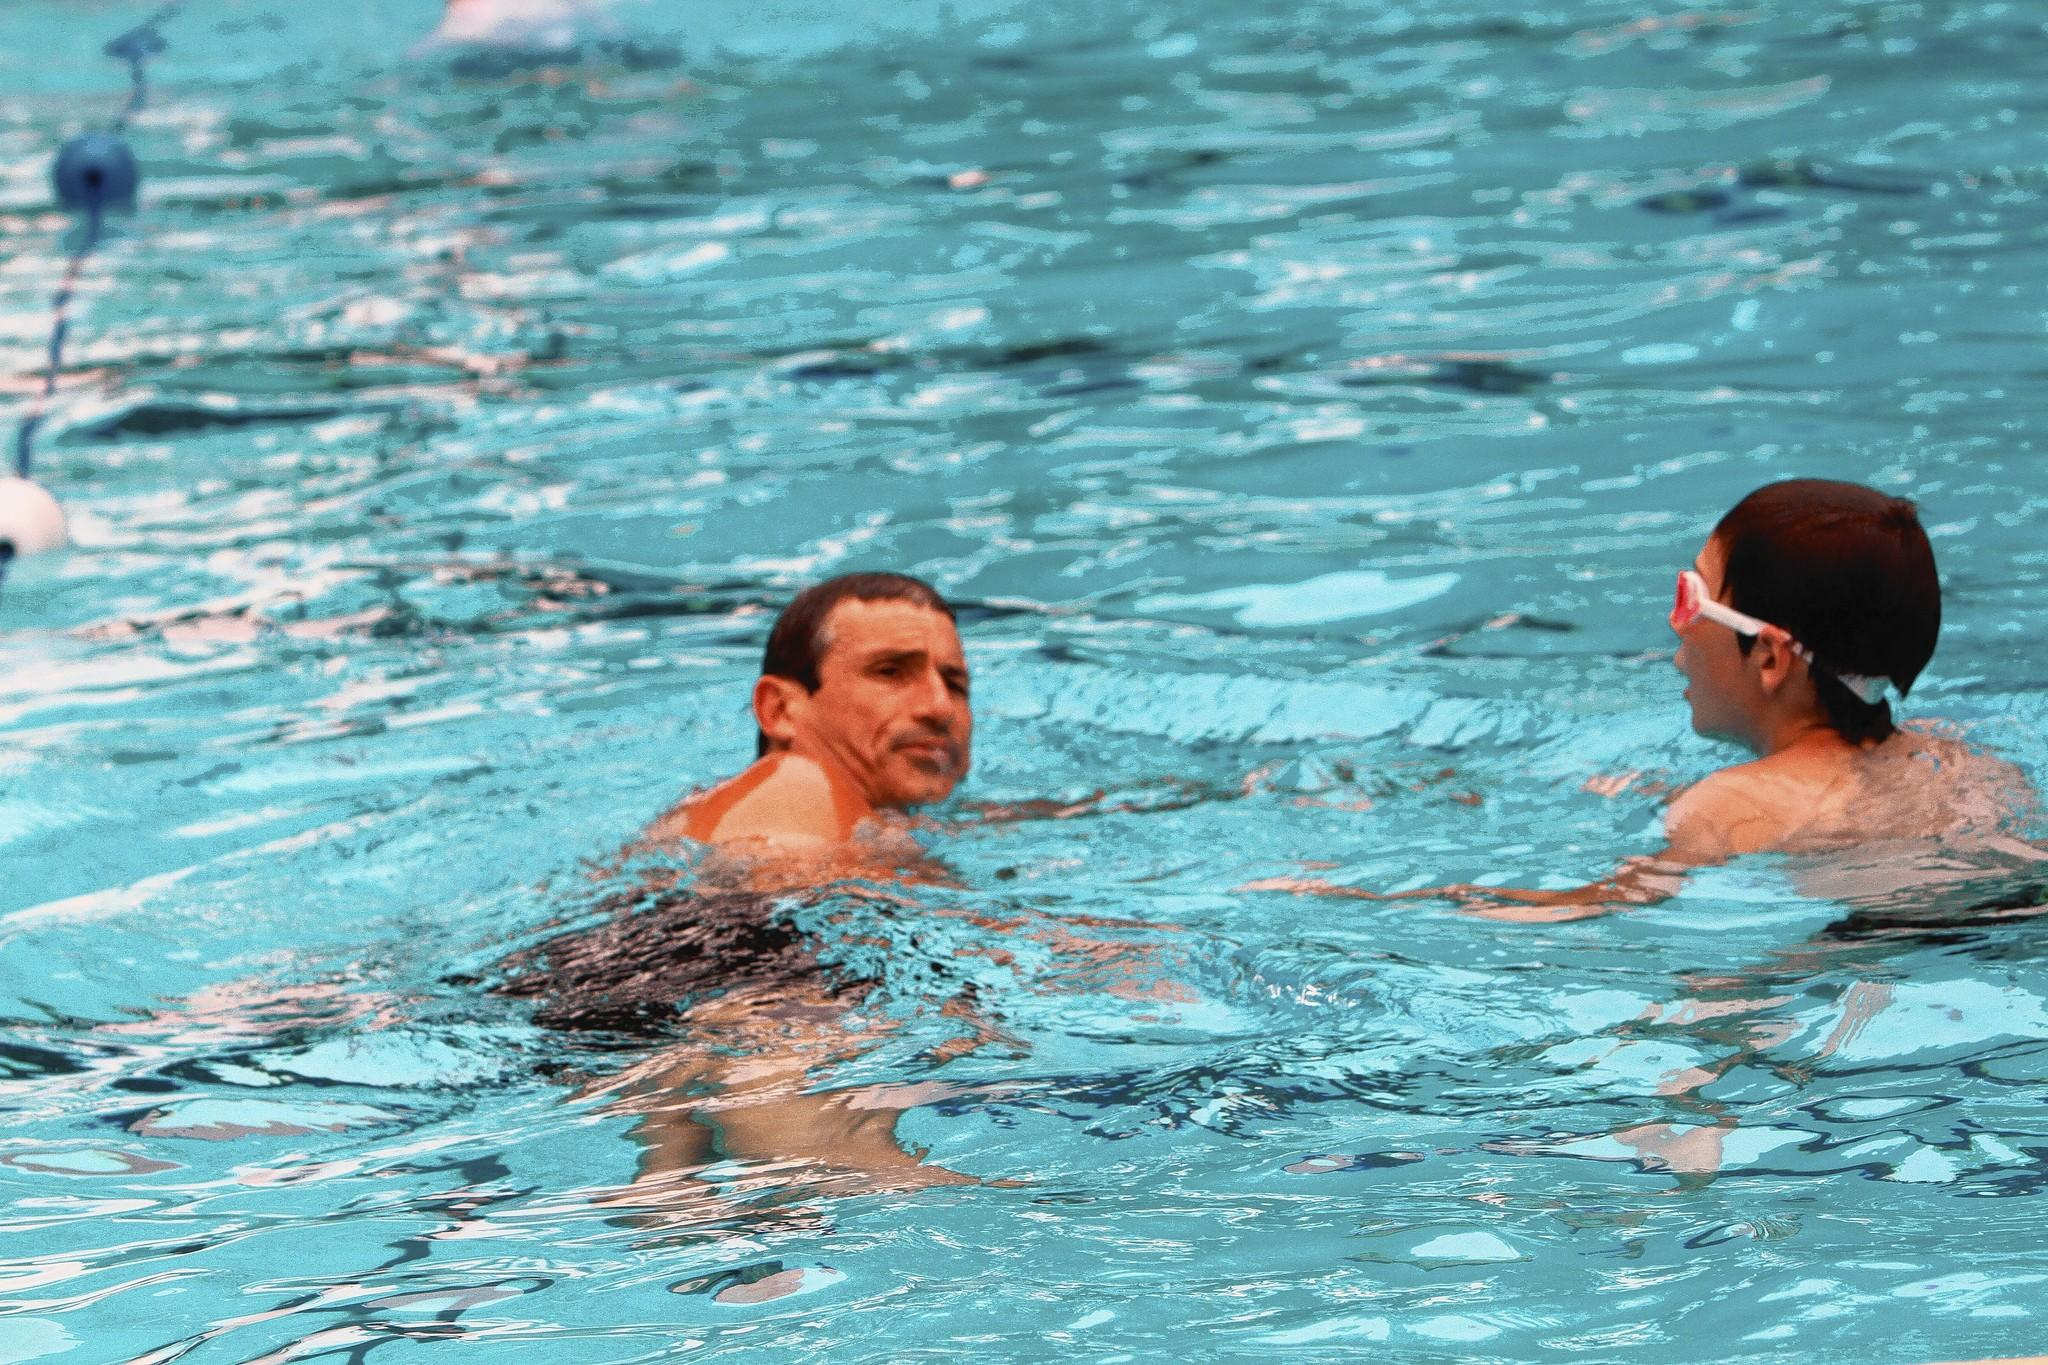 Dominick Castellano coaches his son, Brock Castellano, at the College Park Community Pool.